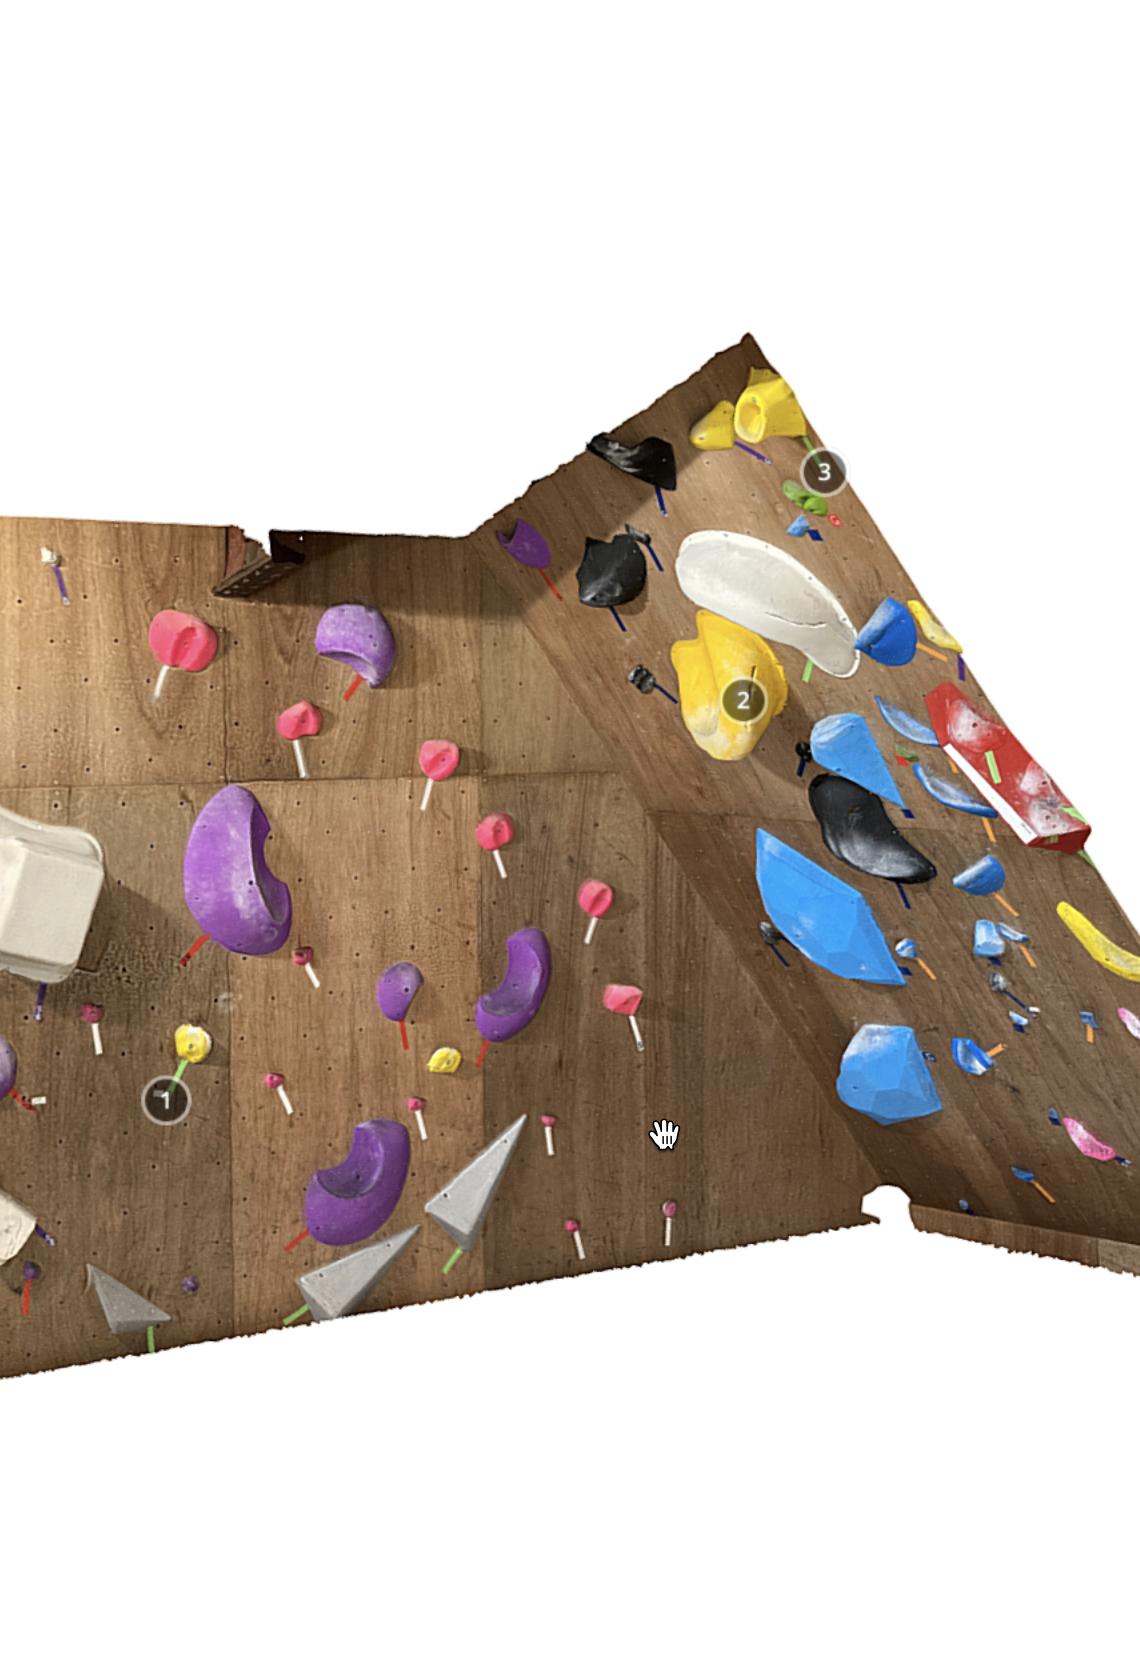 Climbing Gym OLIOLI 1Q